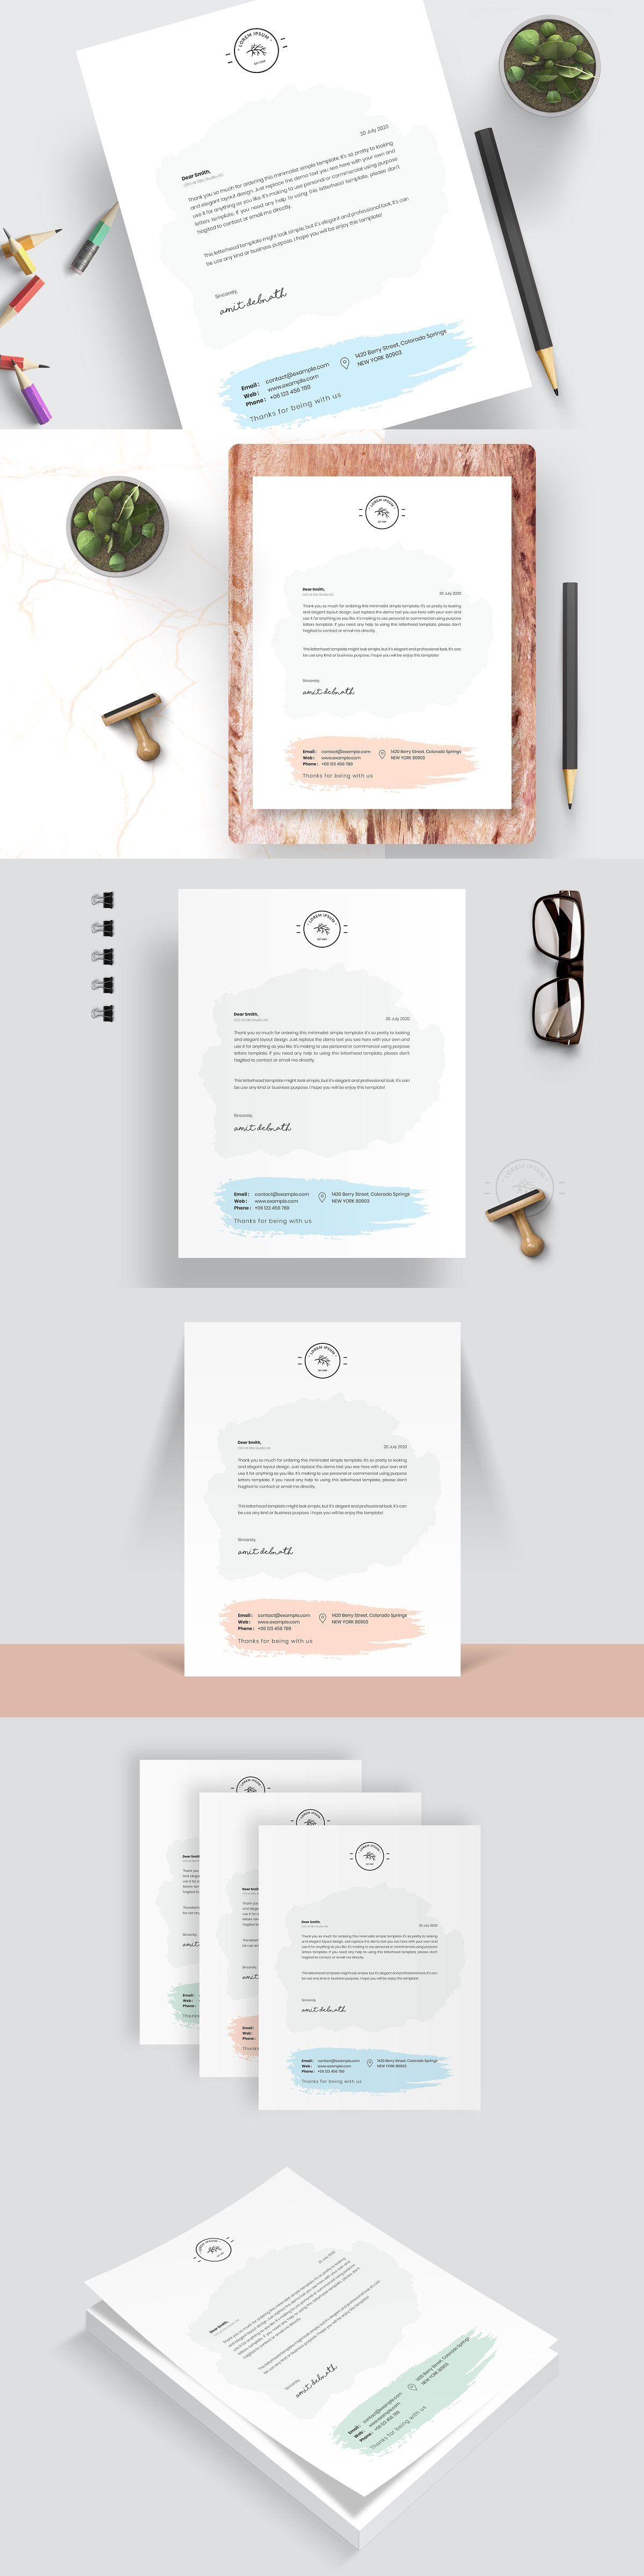 Modern Letterhead in 2020 Stationery templates